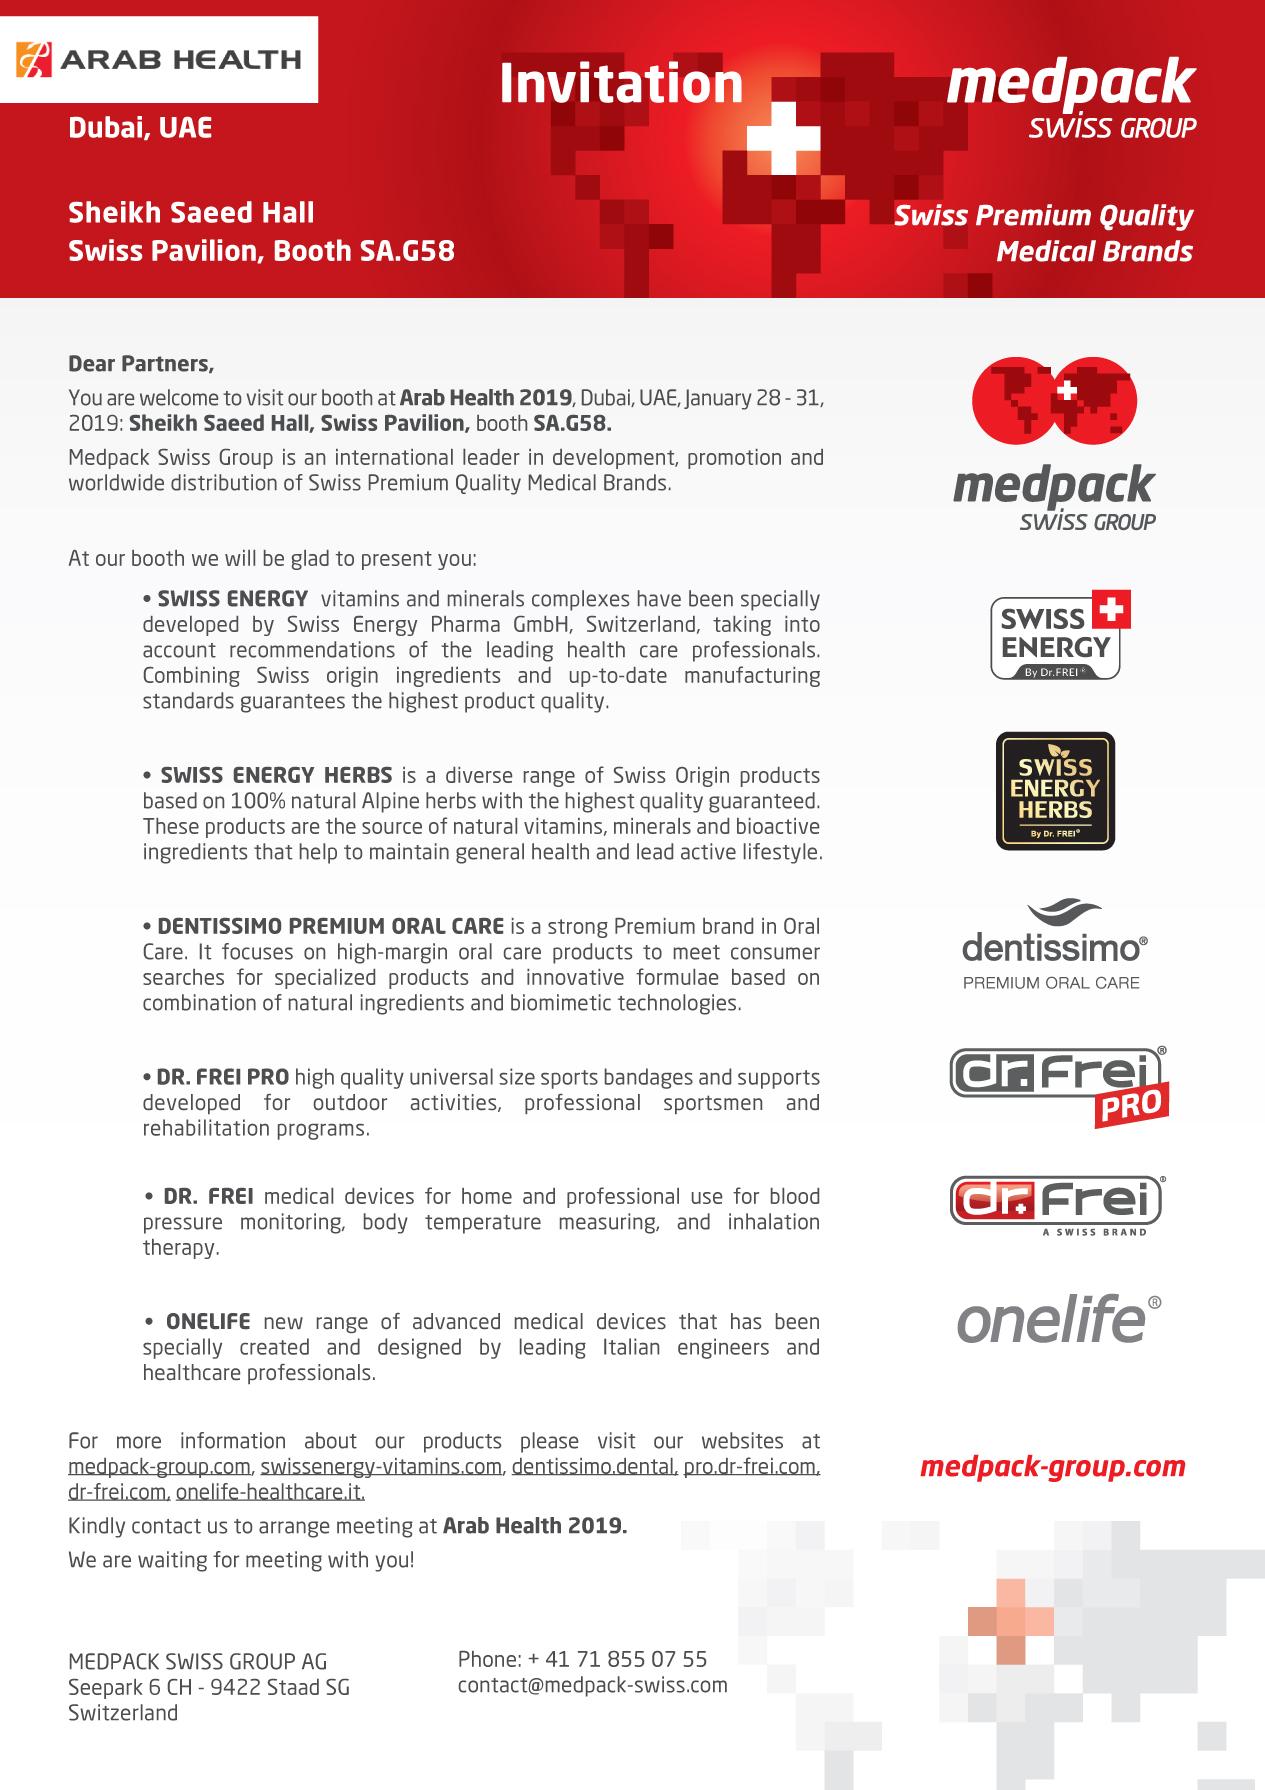 Invitation to Arab Health 2019